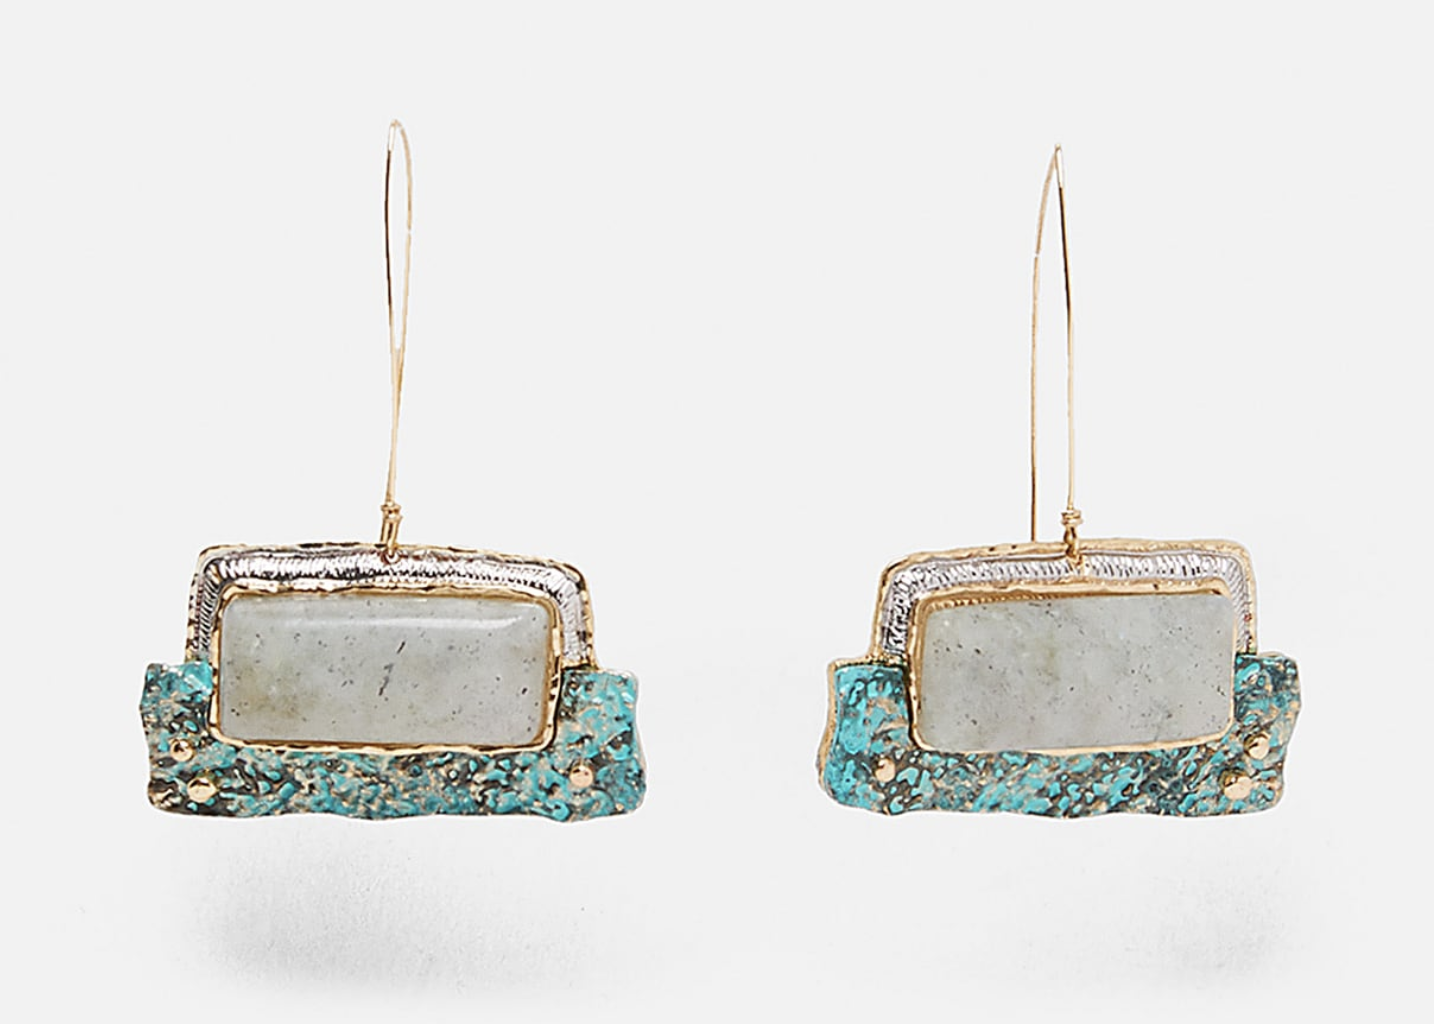 Metallic Zara drop earrings with rectangular stones.